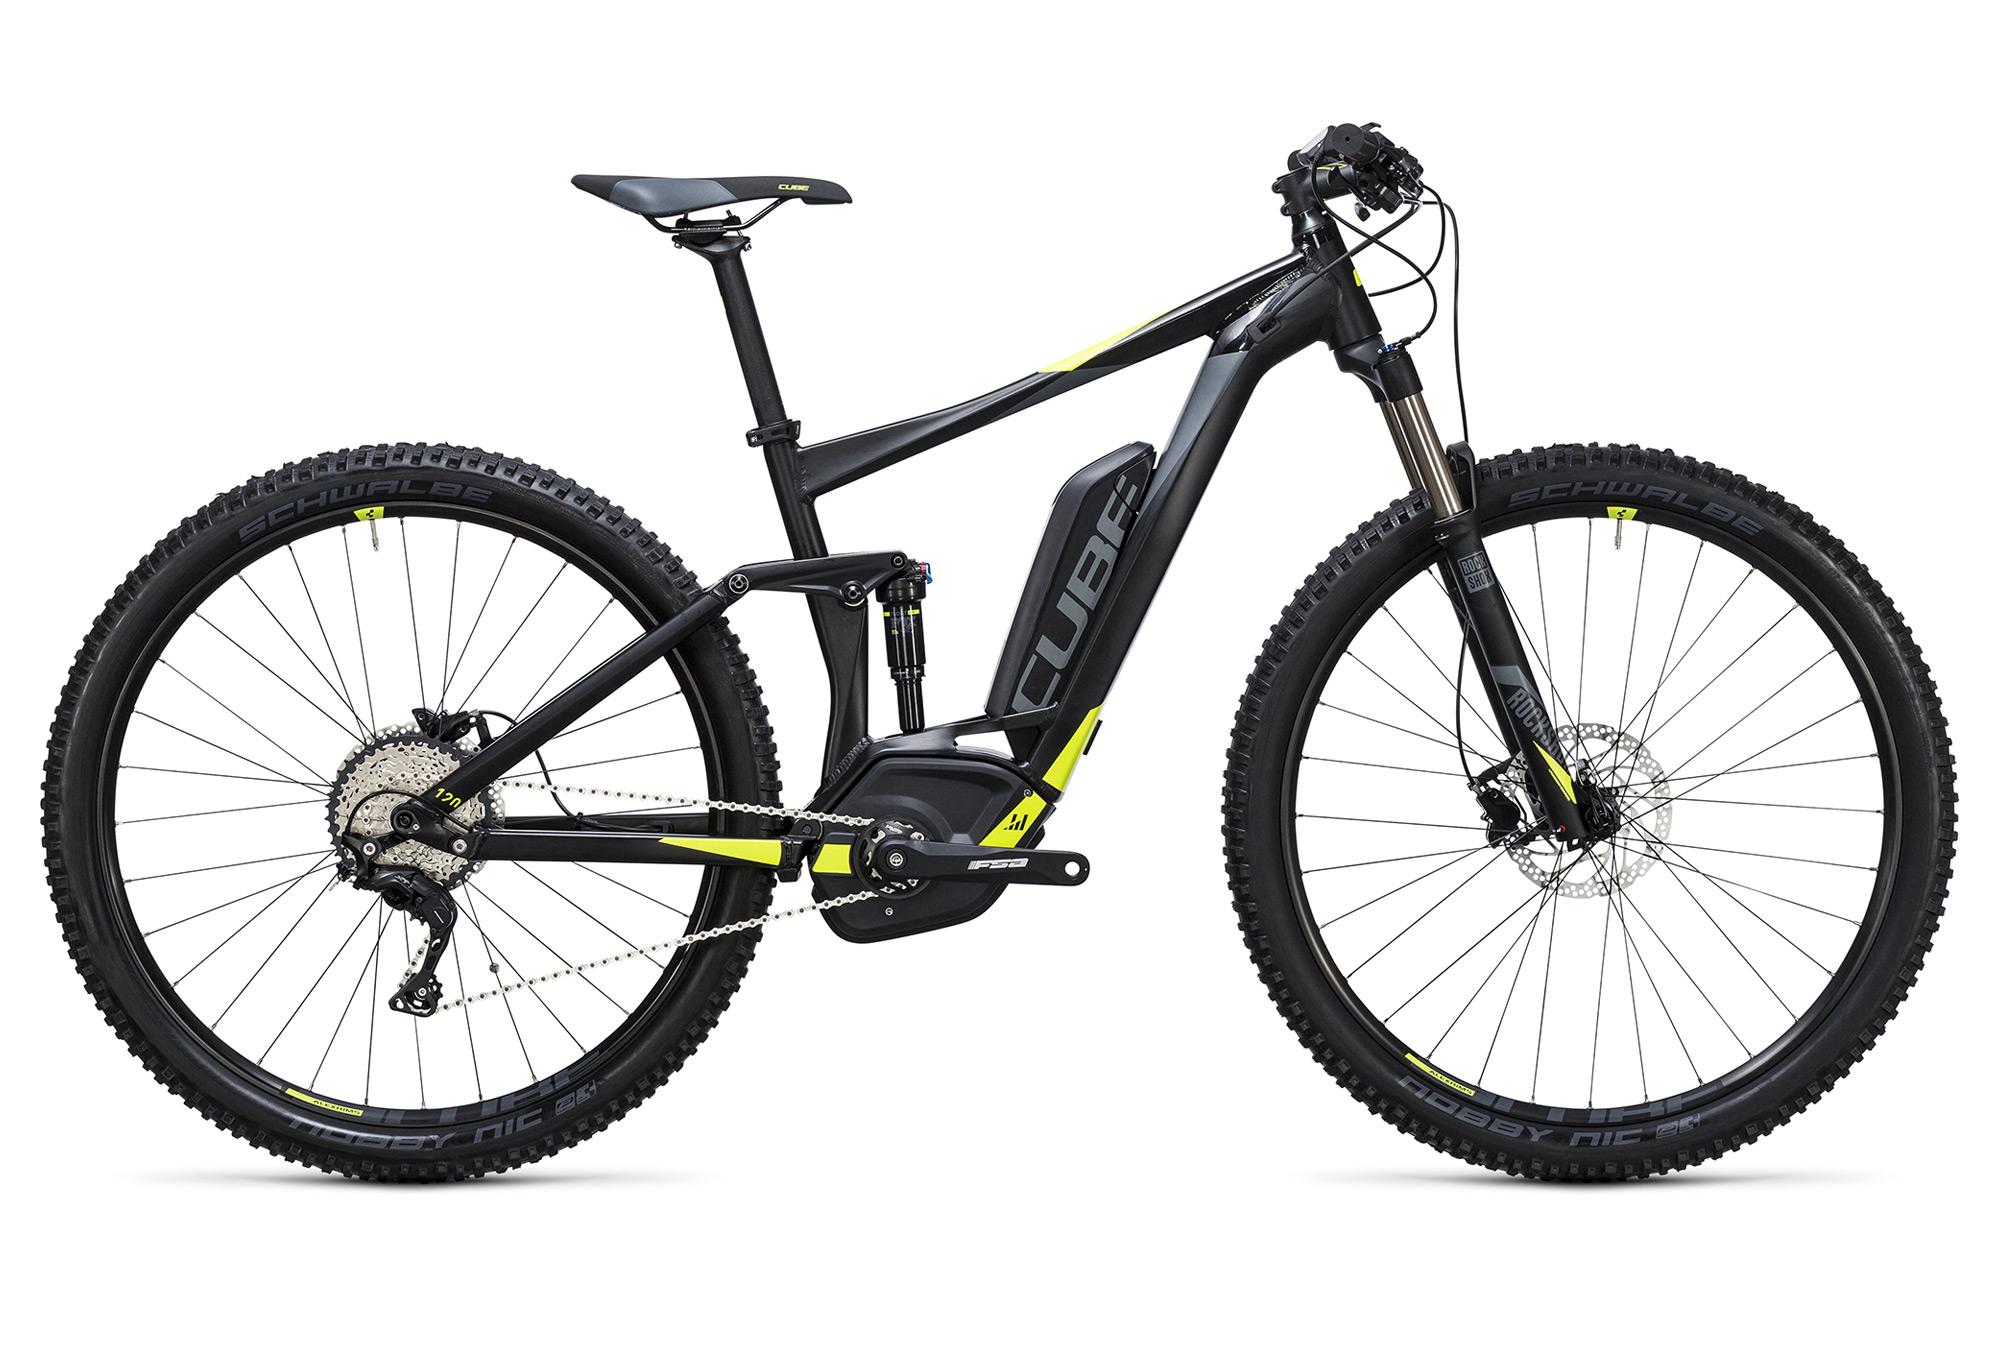 Cube Stereo Hybrid 120 Hpa Pro 500 Bike 27 5 Boost Shimano Xt 11s Black Yellow